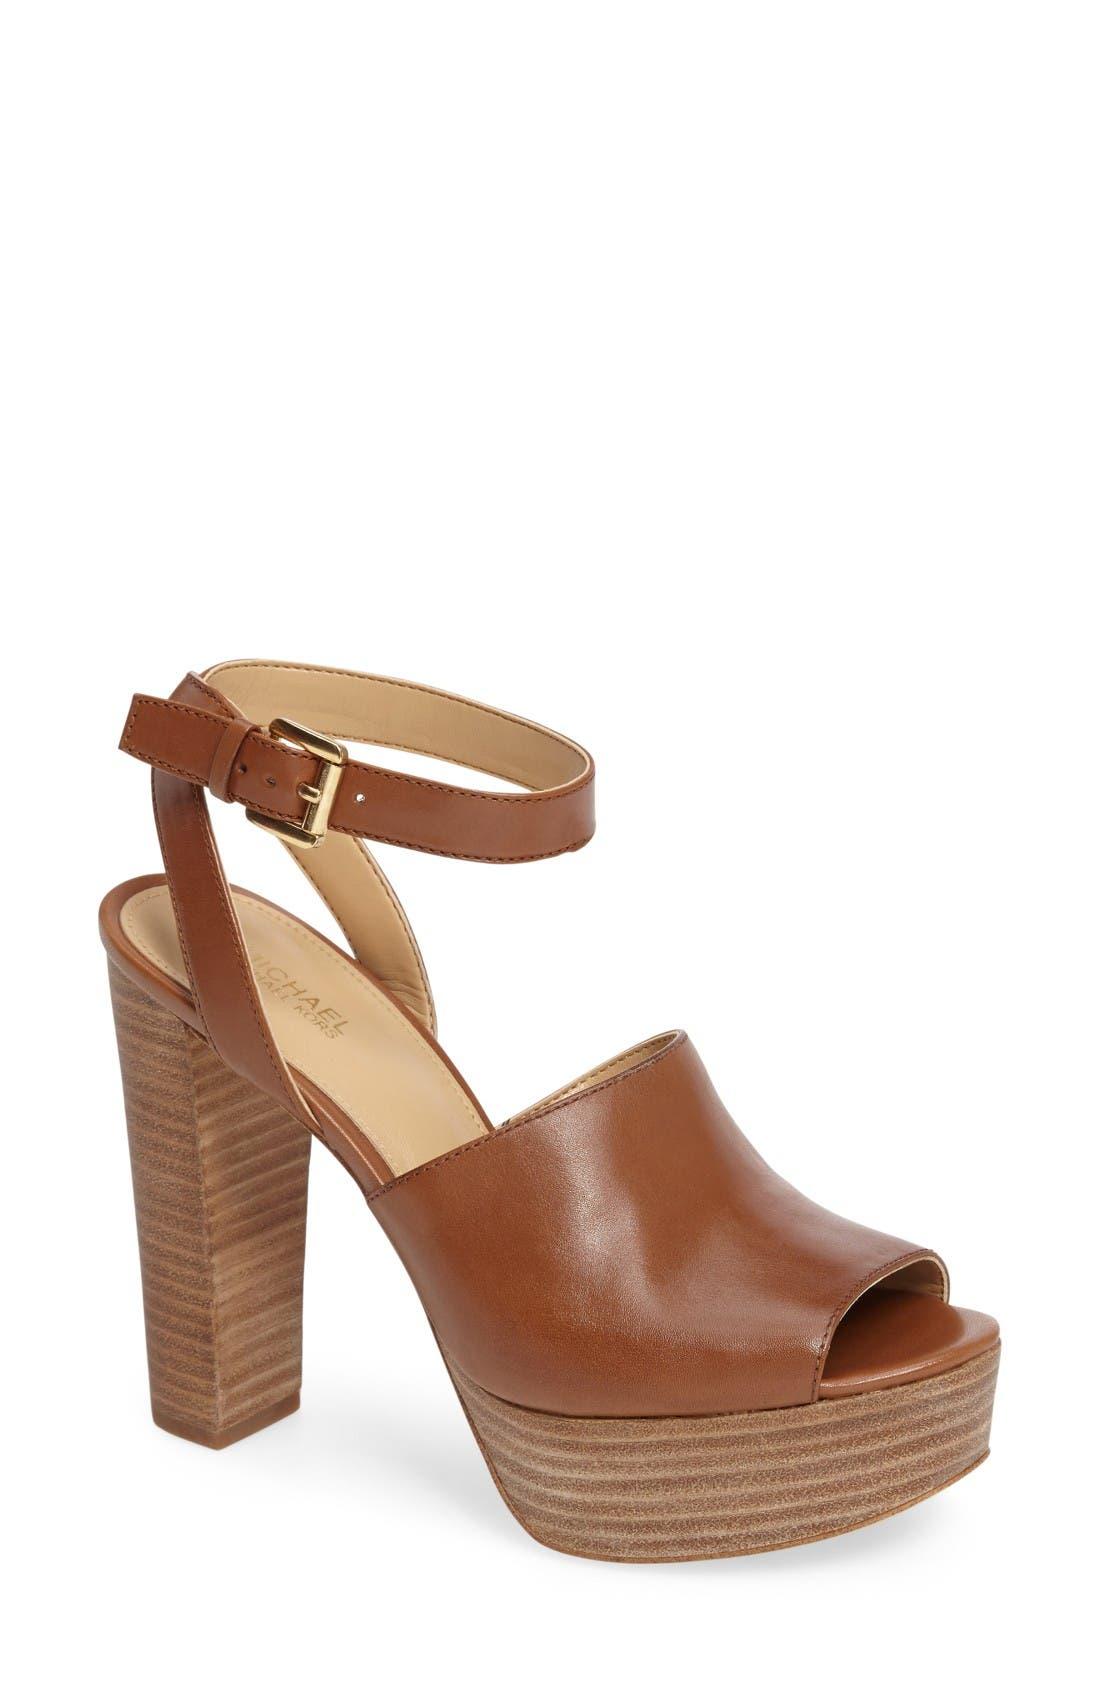 Main Image - MICHAEL Michael Kors Trina Platform Sandal (Women)